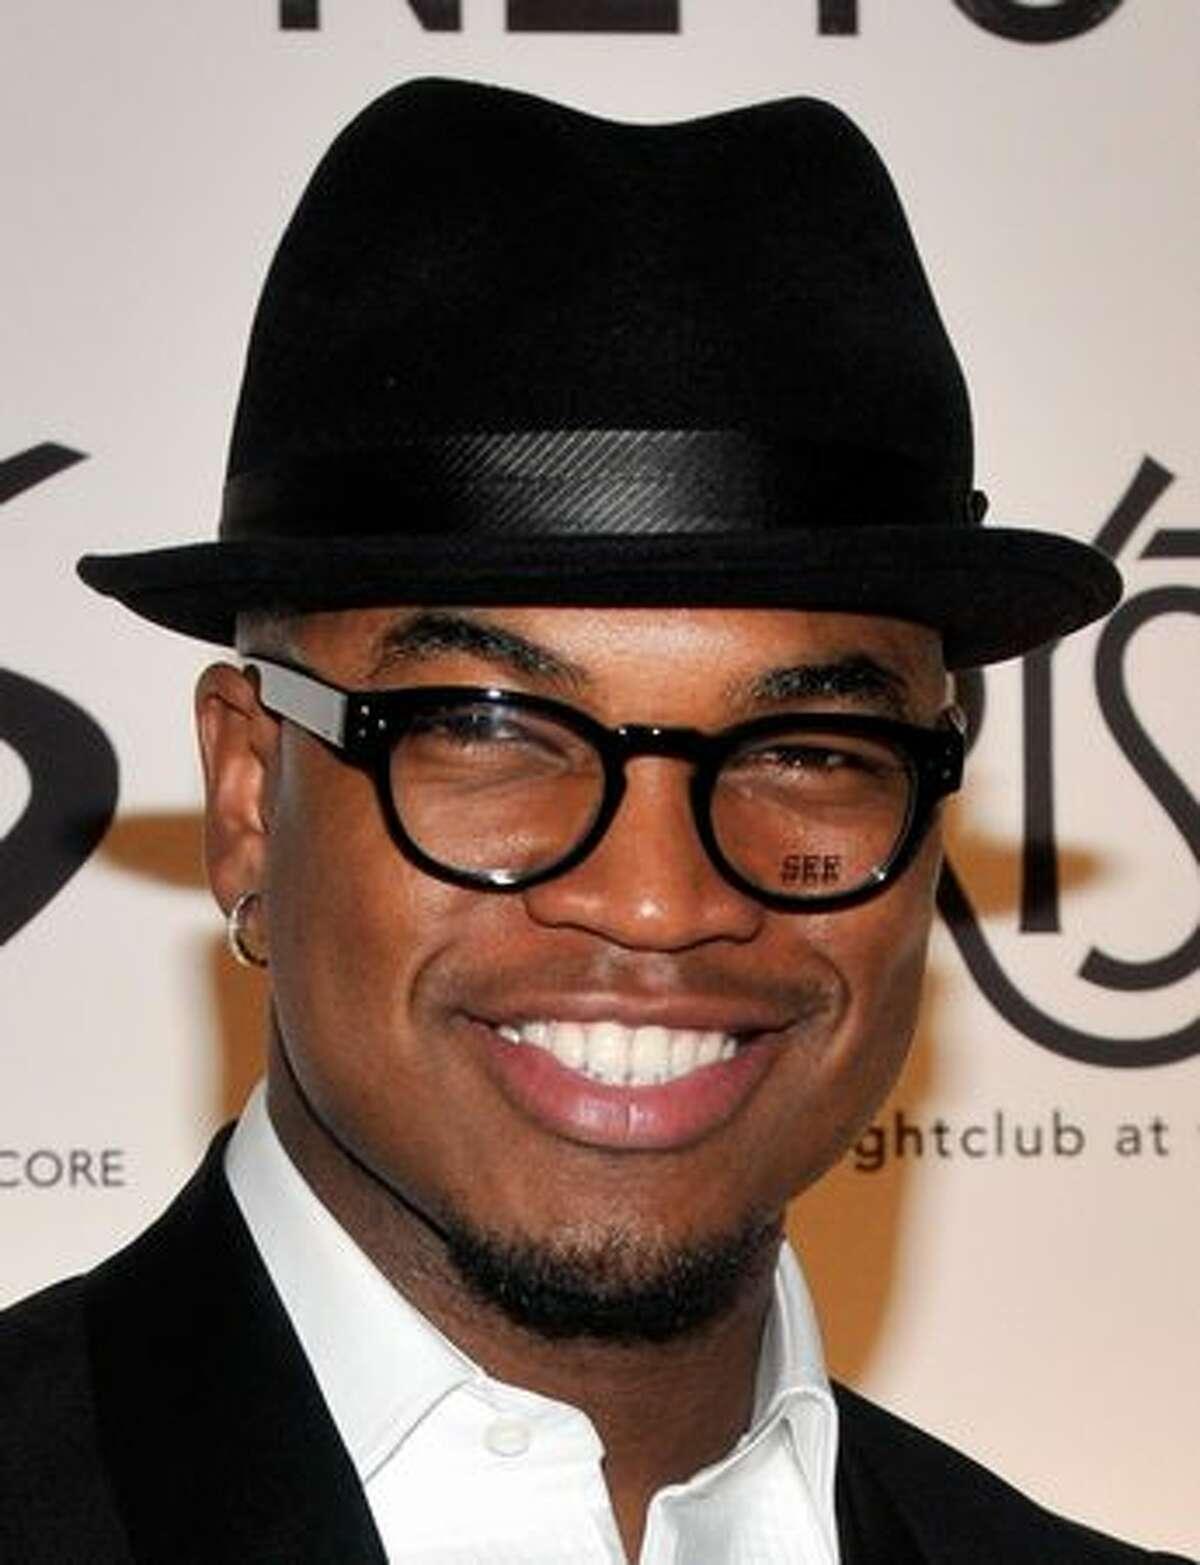 Singer/songwriter Ne-Yo arrives to celebrate his birthday at the Tryst nightclub in Las Vegas, Nevada.